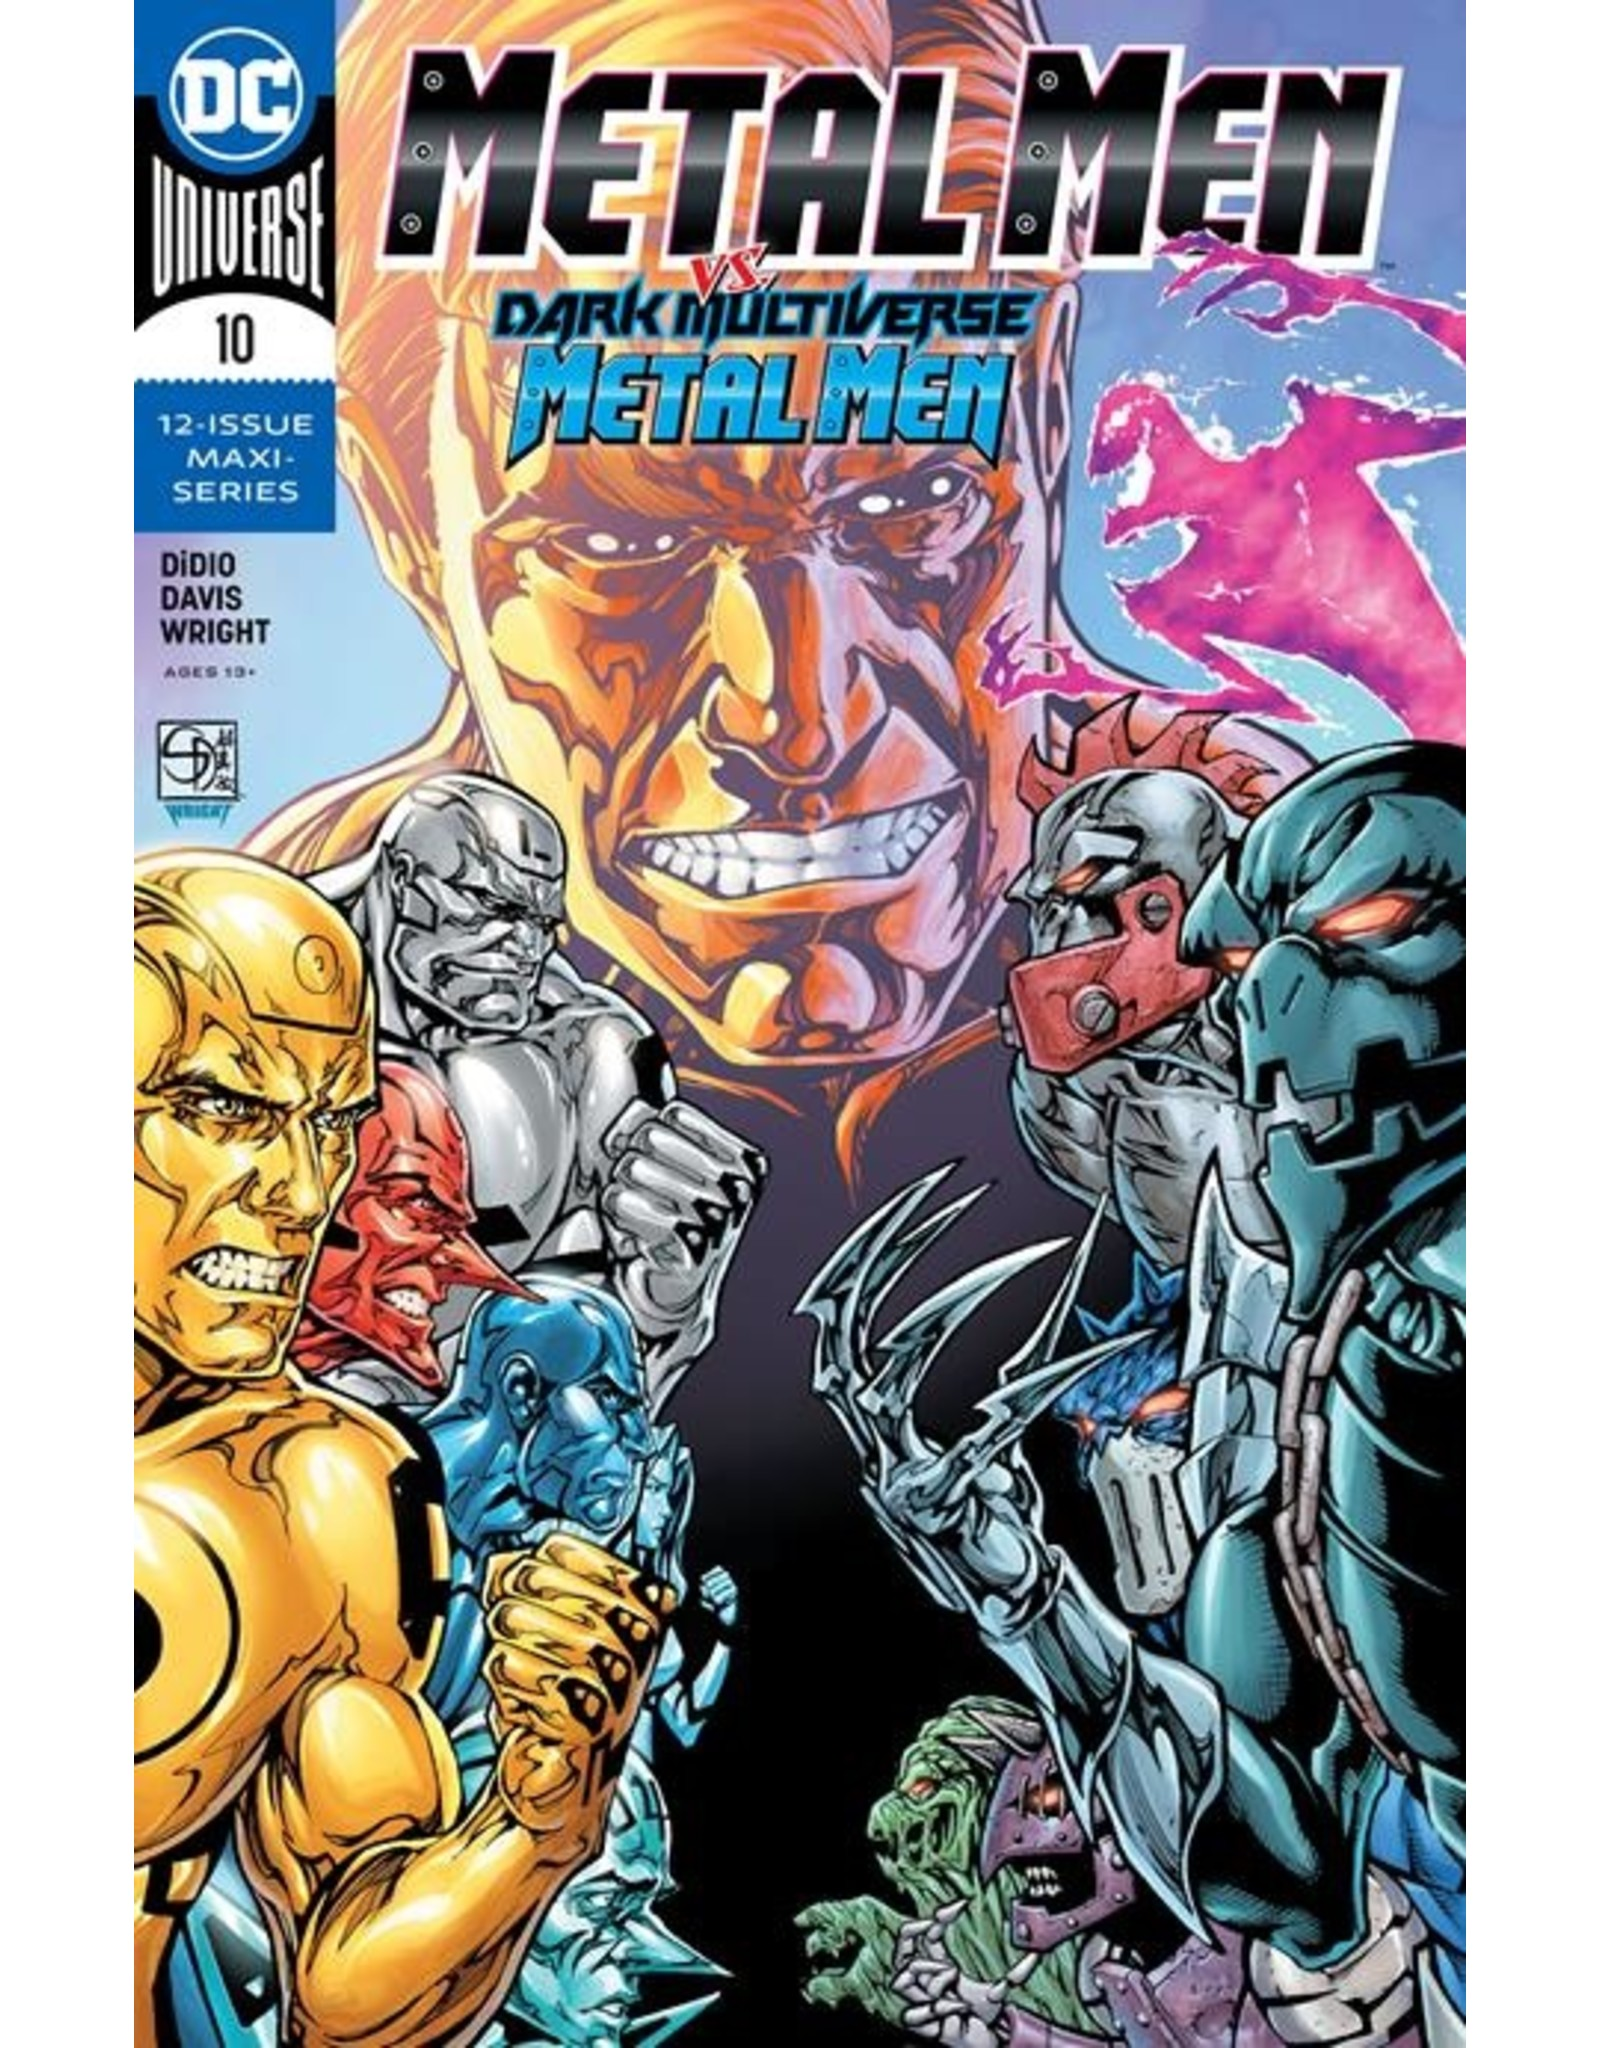 DC COMICS METAL MEN #10 CVR A SHANE DAVIS